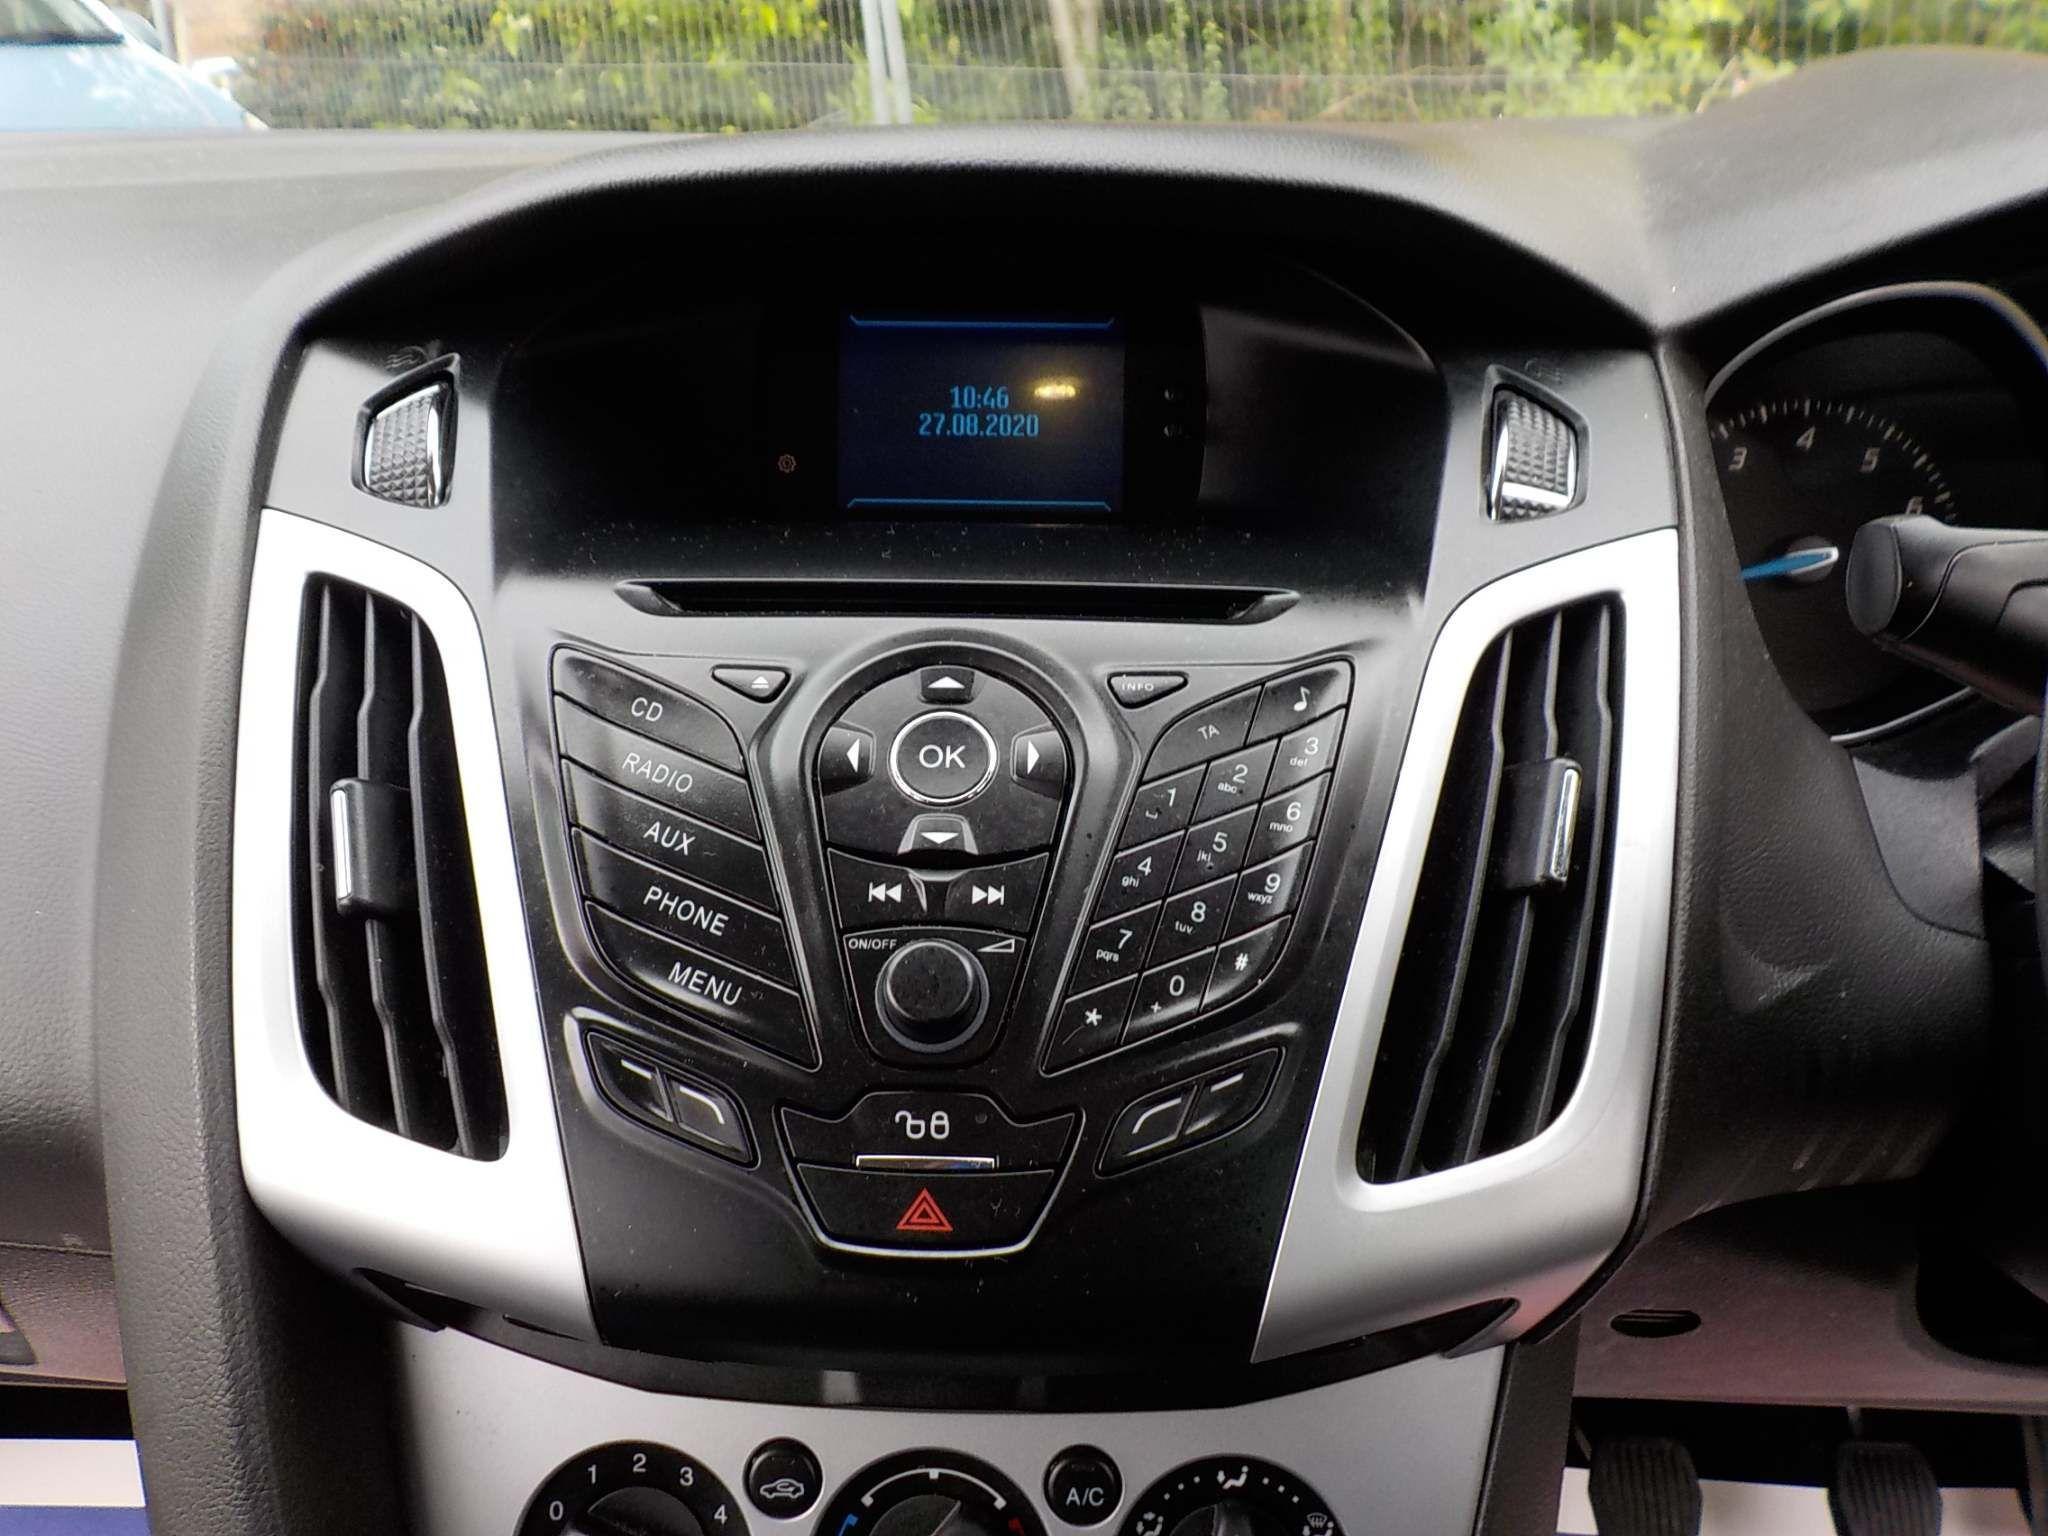 Ford Focus 1.6 Ti-VCT Zetec 5dr